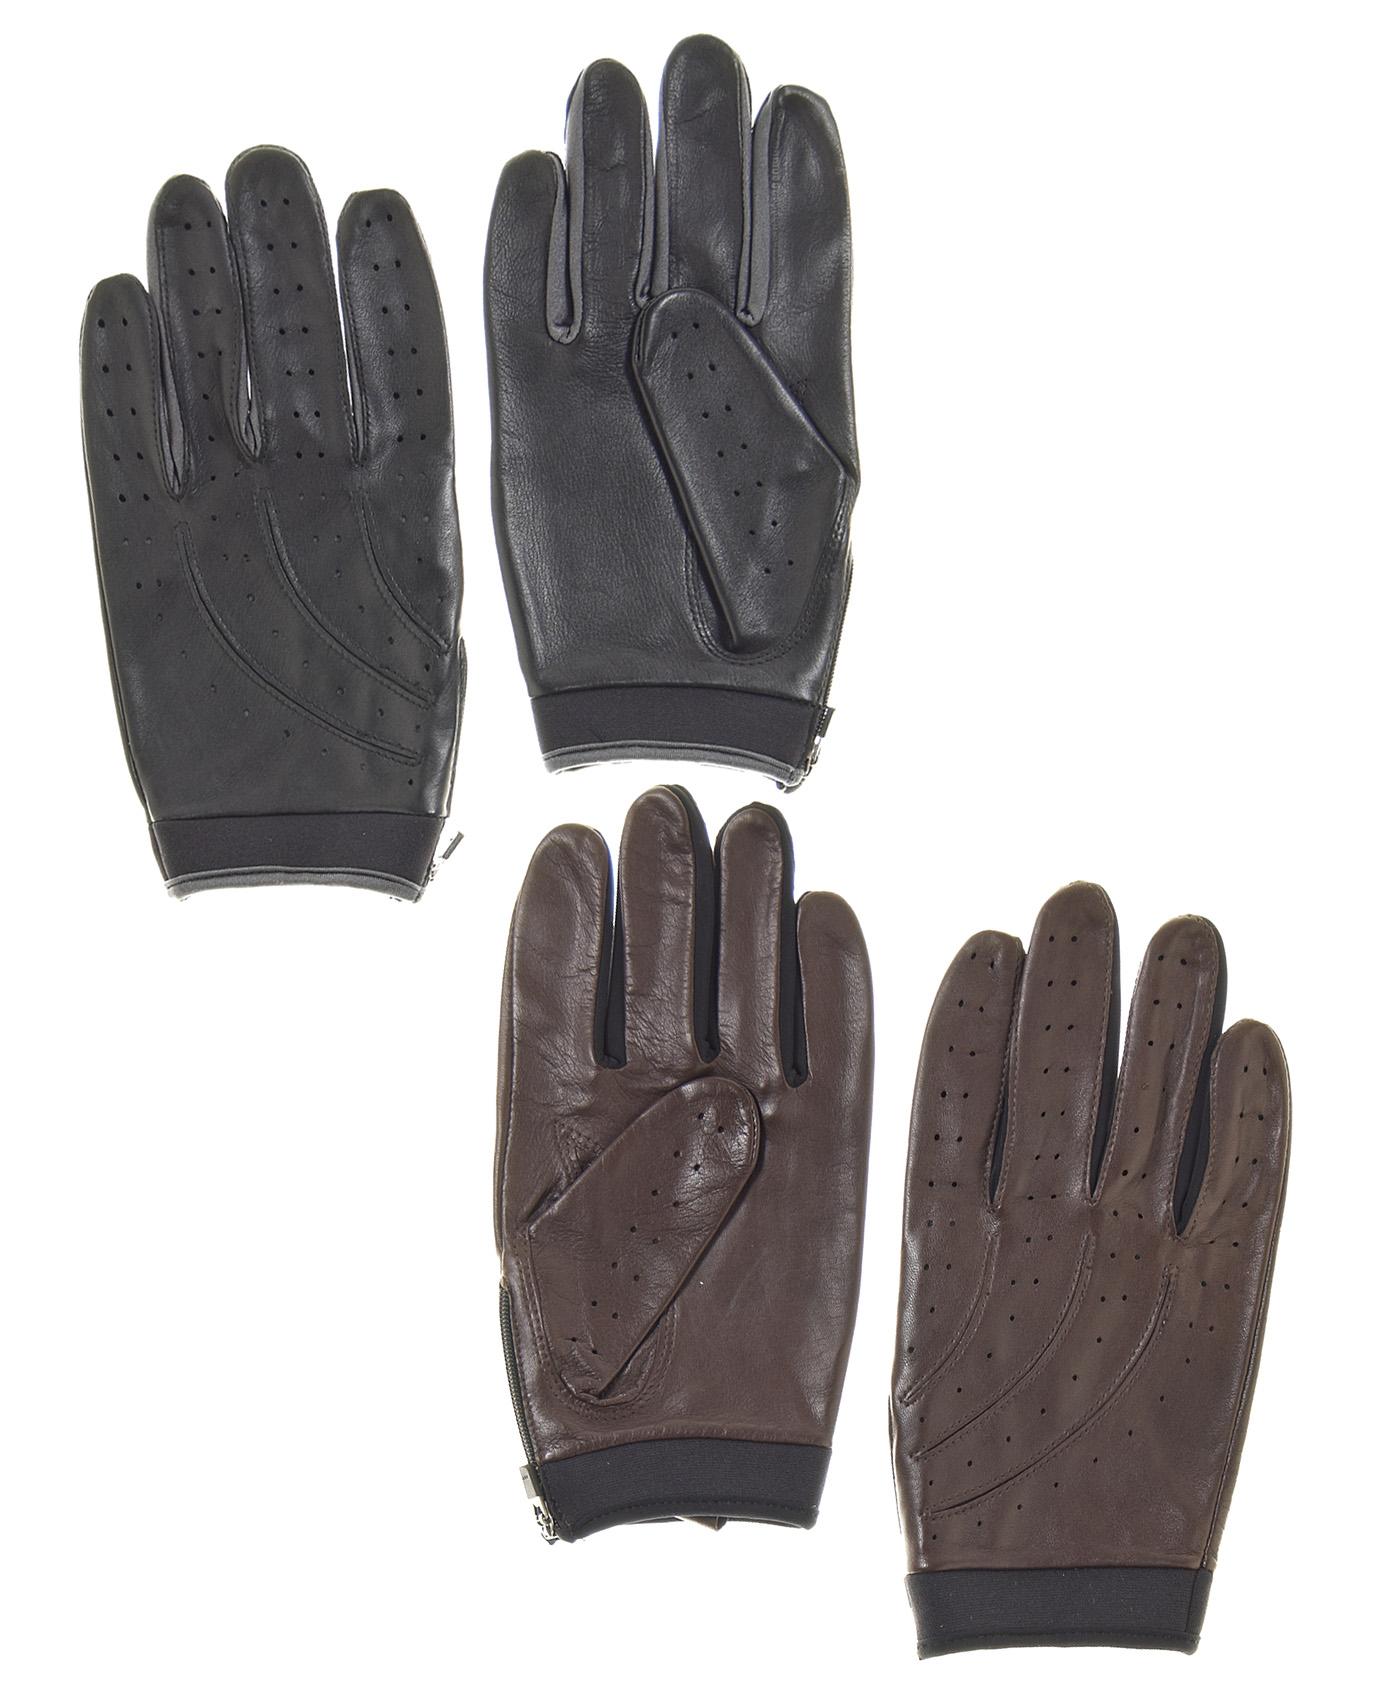 Red leather driving gloves mens - Driving Gloves At Walmart Pratt And Hart Men S Hugger Leather Lycra Driving Gloves